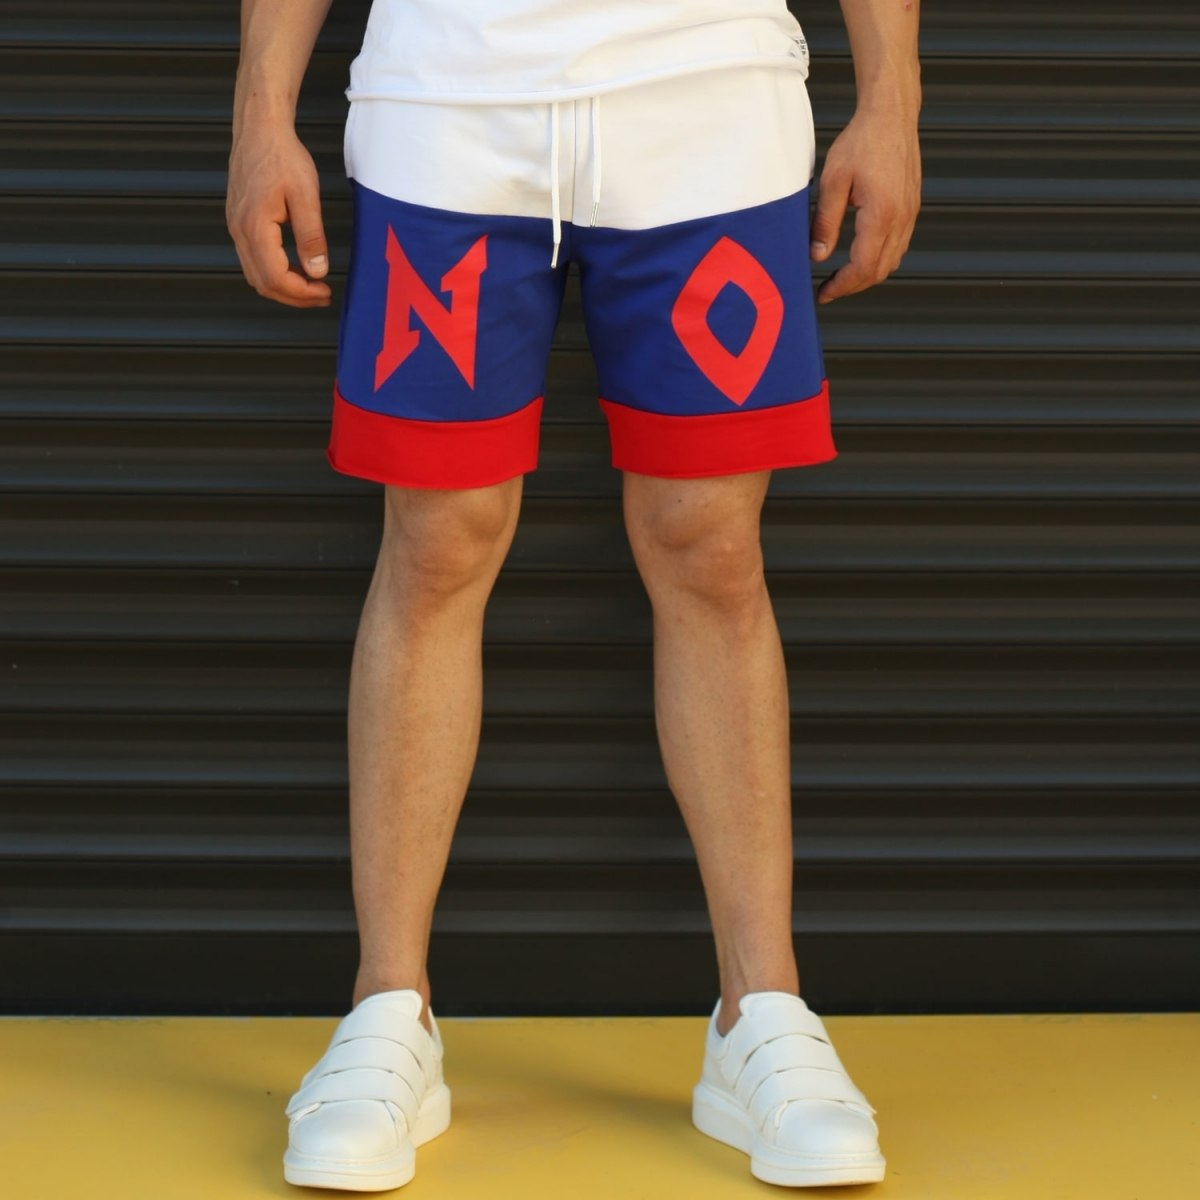 Men's NO Printed Fleece Sport Shorts Blue Mv Premium Brand - 1